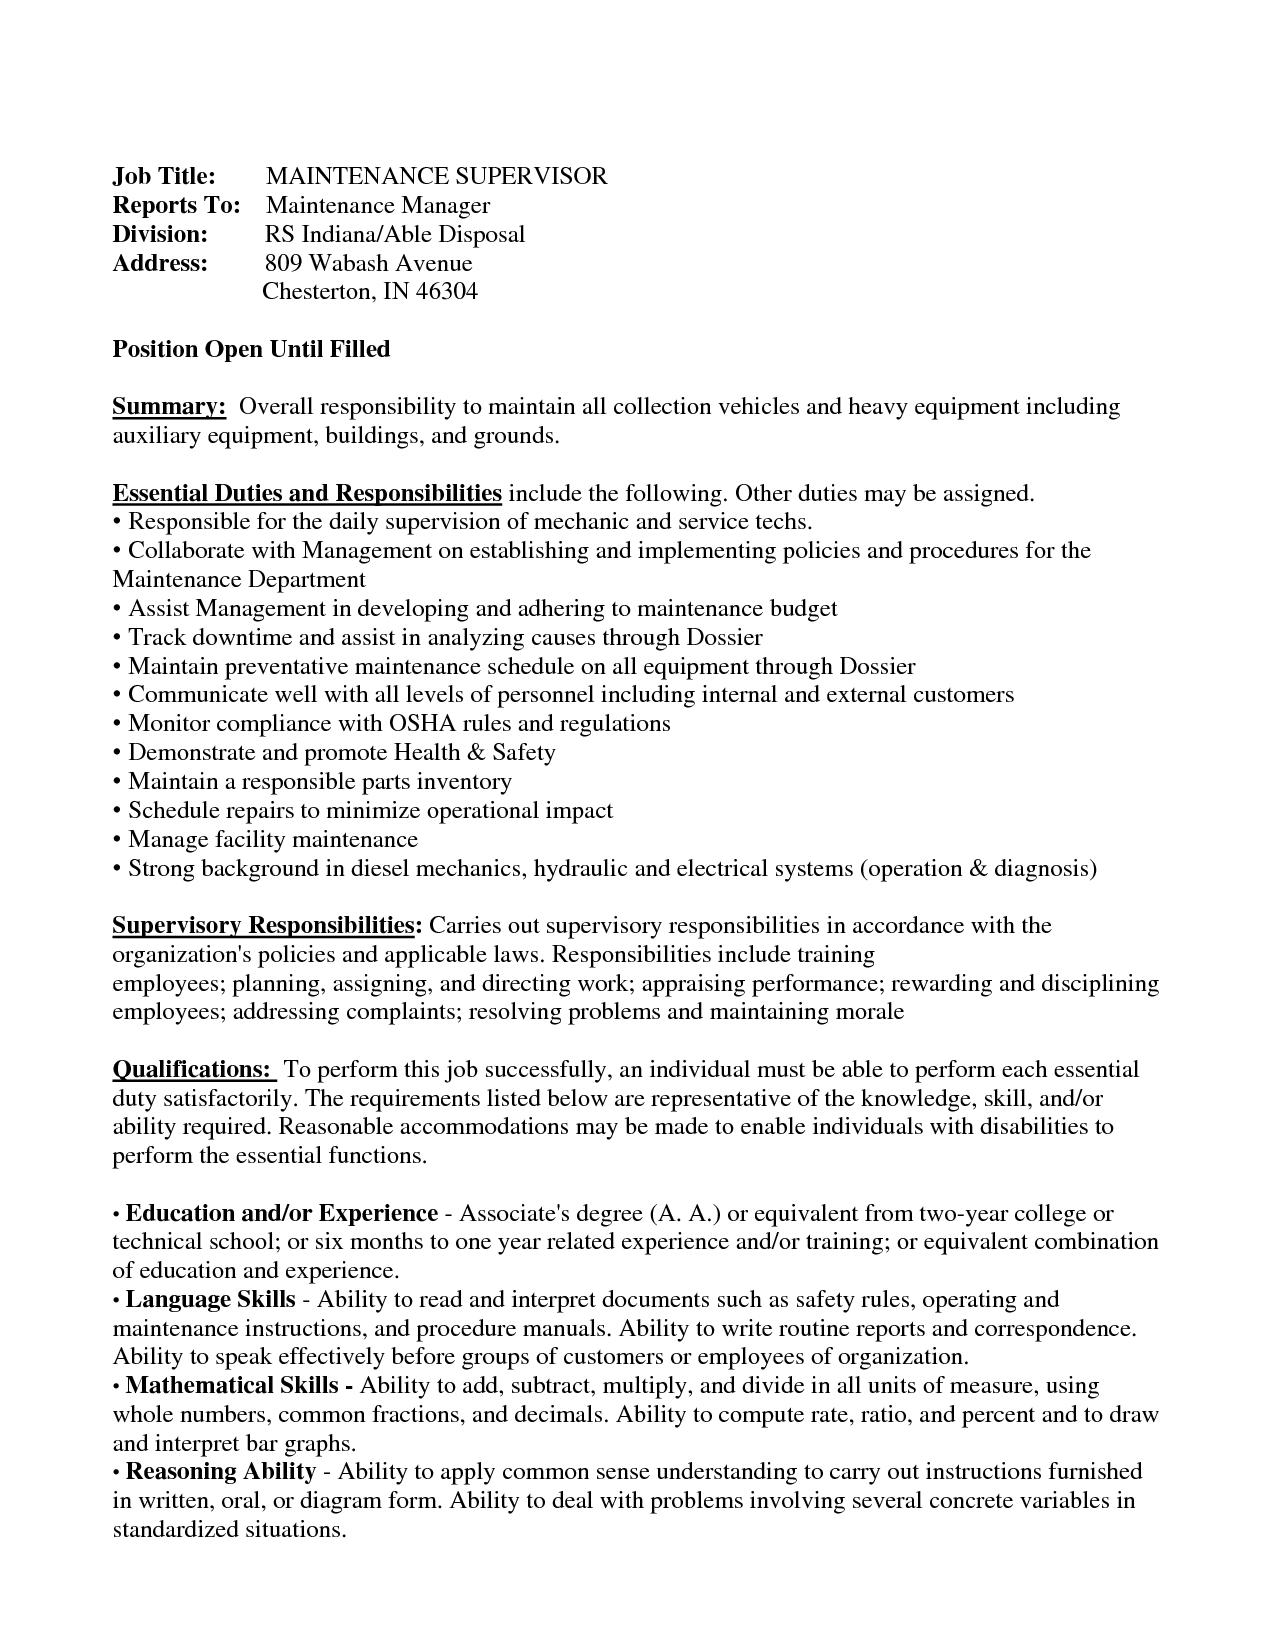 Maintenance Supervisor Resume Resumes Maintenance Supervisor  Google Search  Tom  Pinterest